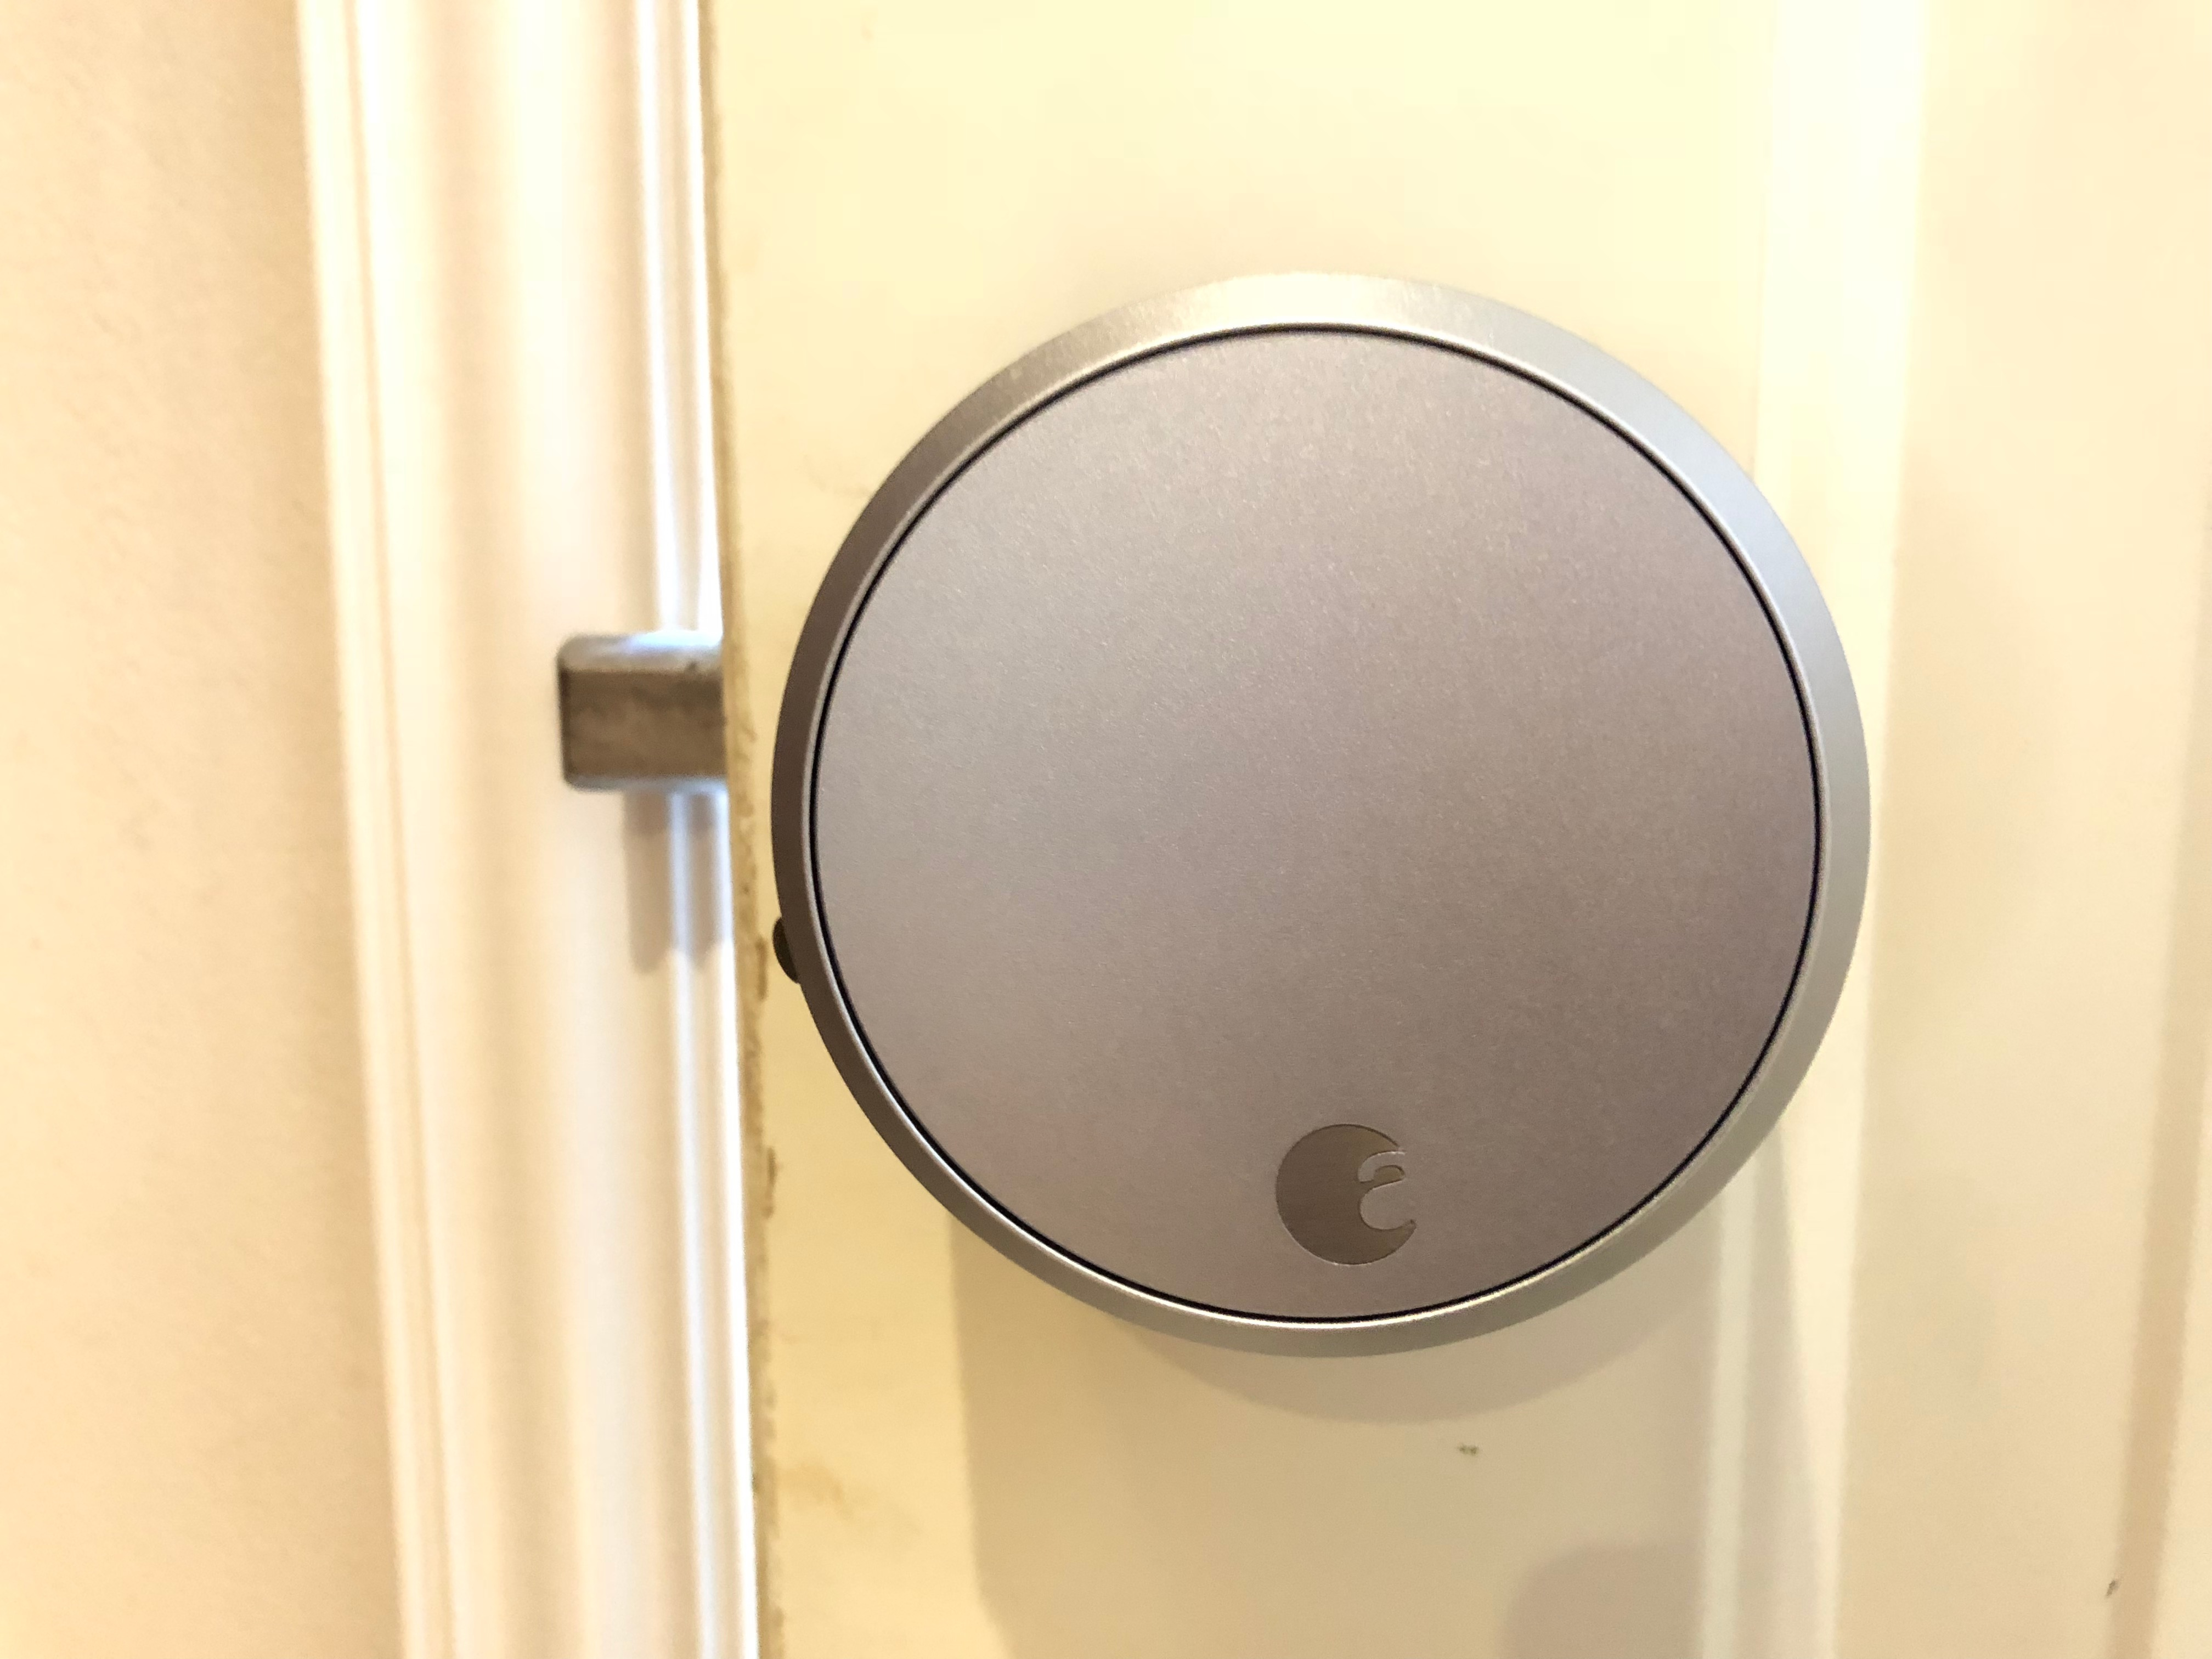 August Wi Fi Smart Lock Pro Connect Silver Smart Locks